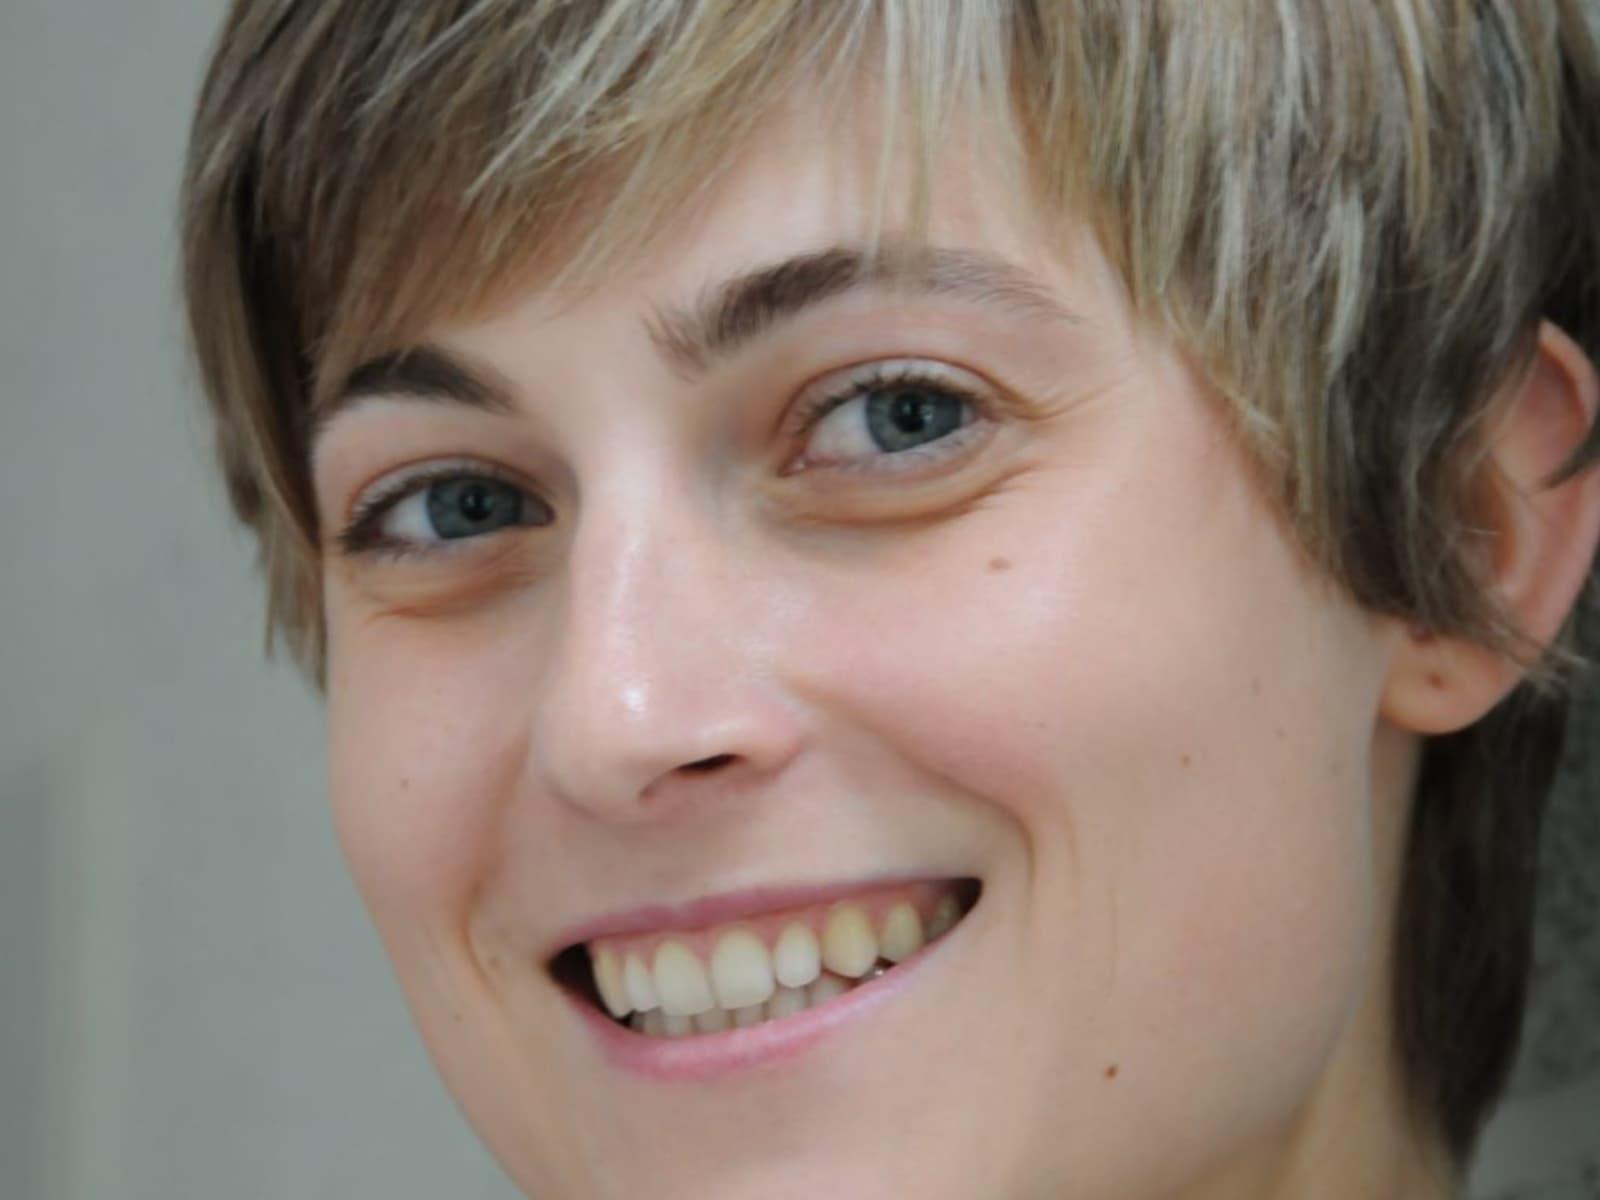 Amina from Buggenhout, Belgium